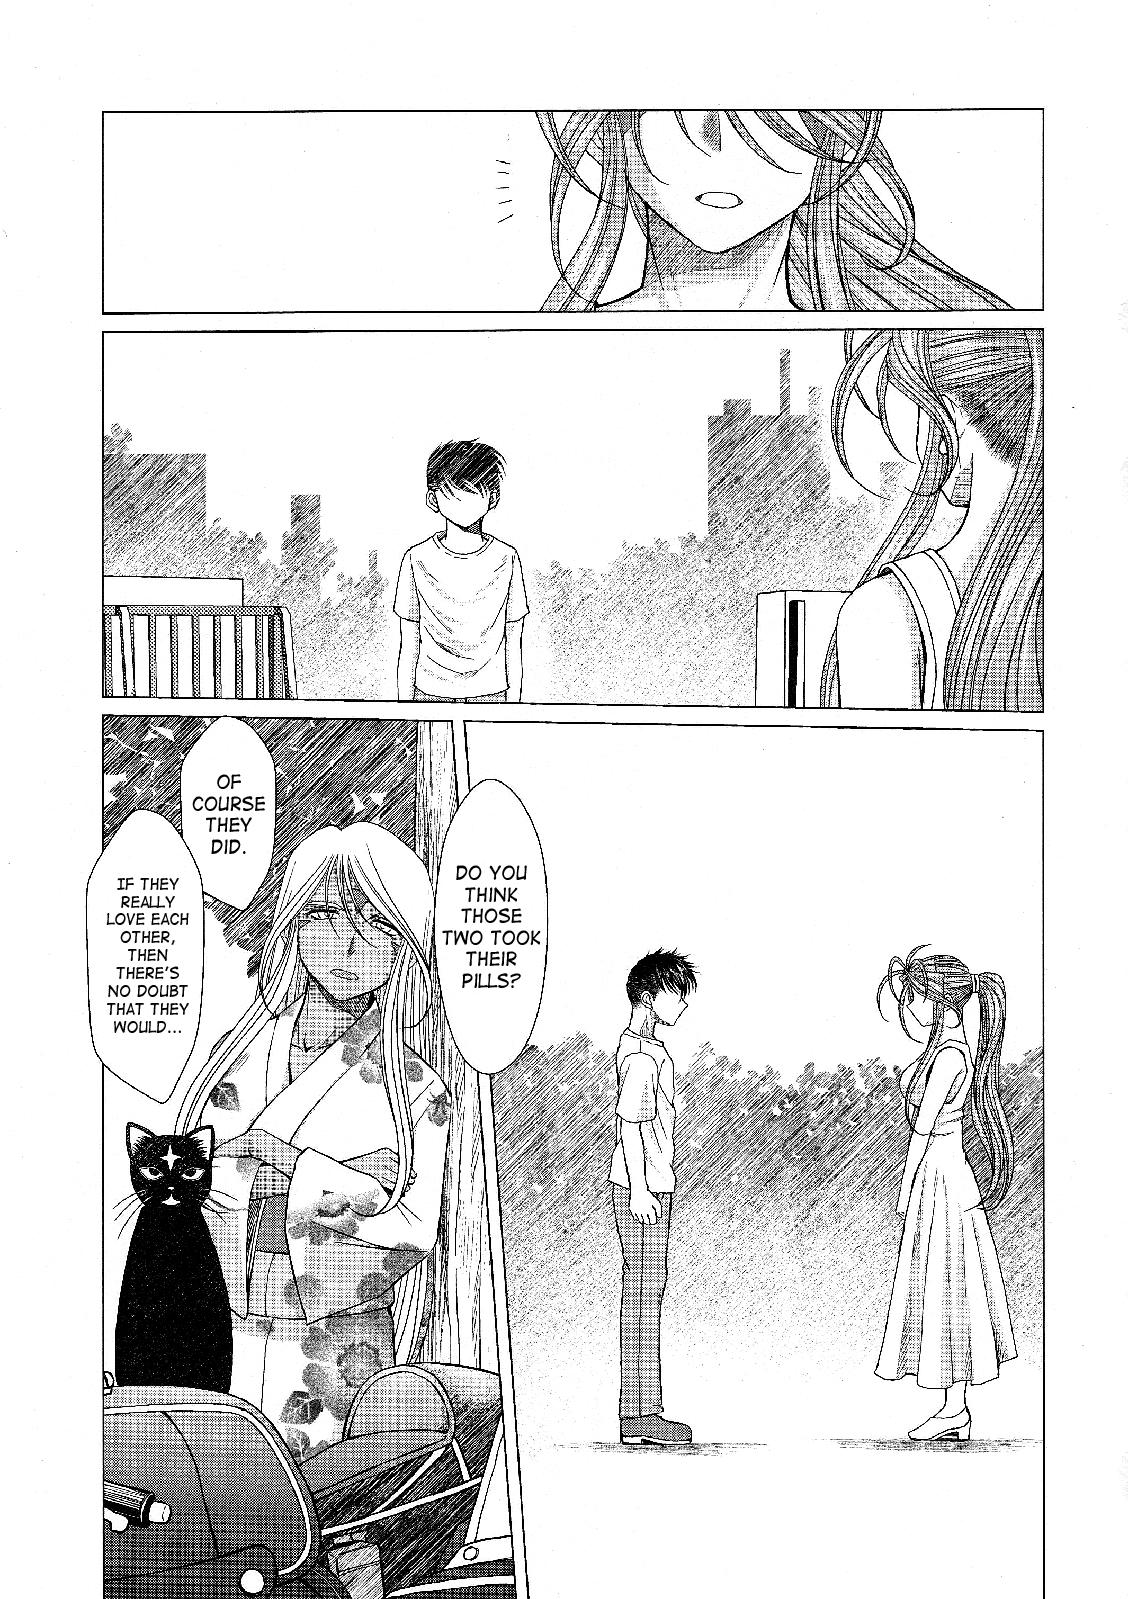 (C63) [CIRCLE OUTERWORLD (Chiba Shuusaku)] Midgard  (Ah! My Goddess) complete [eng] 668